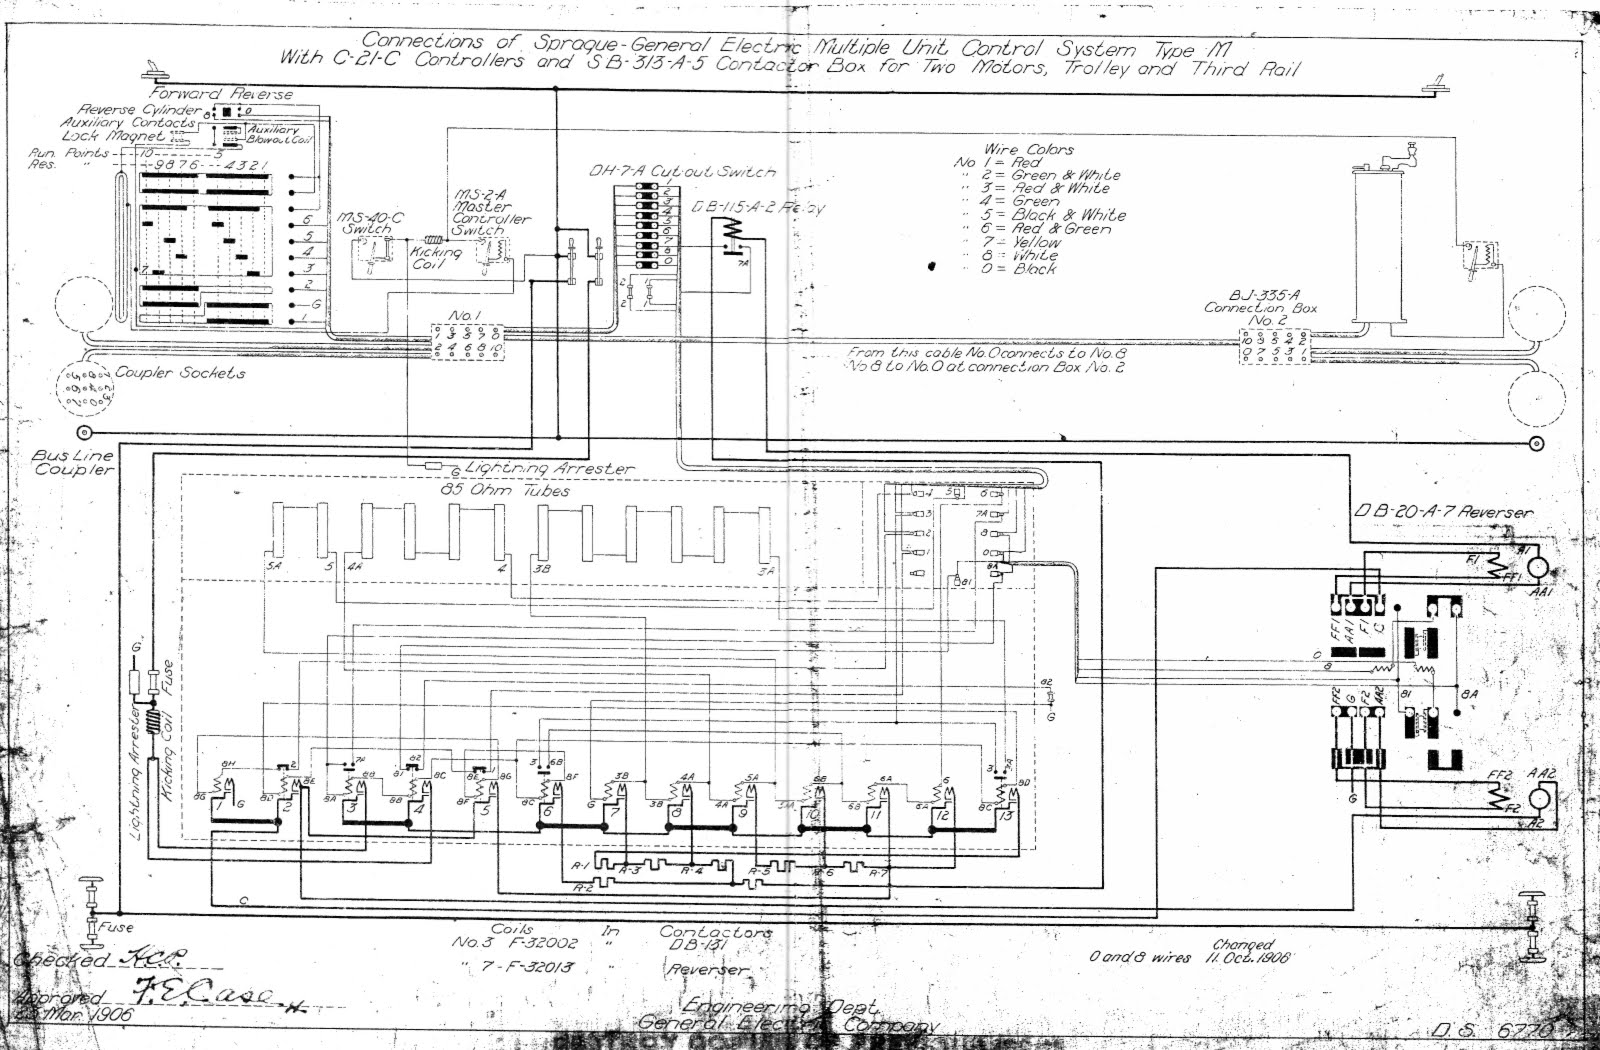 Tata+Nano+Electrical+Wiring+Diagram?t=1508755195 tata car manuals, wiring diagrams pdf & fault codes tata nano fuse box diagram at nearapp.co